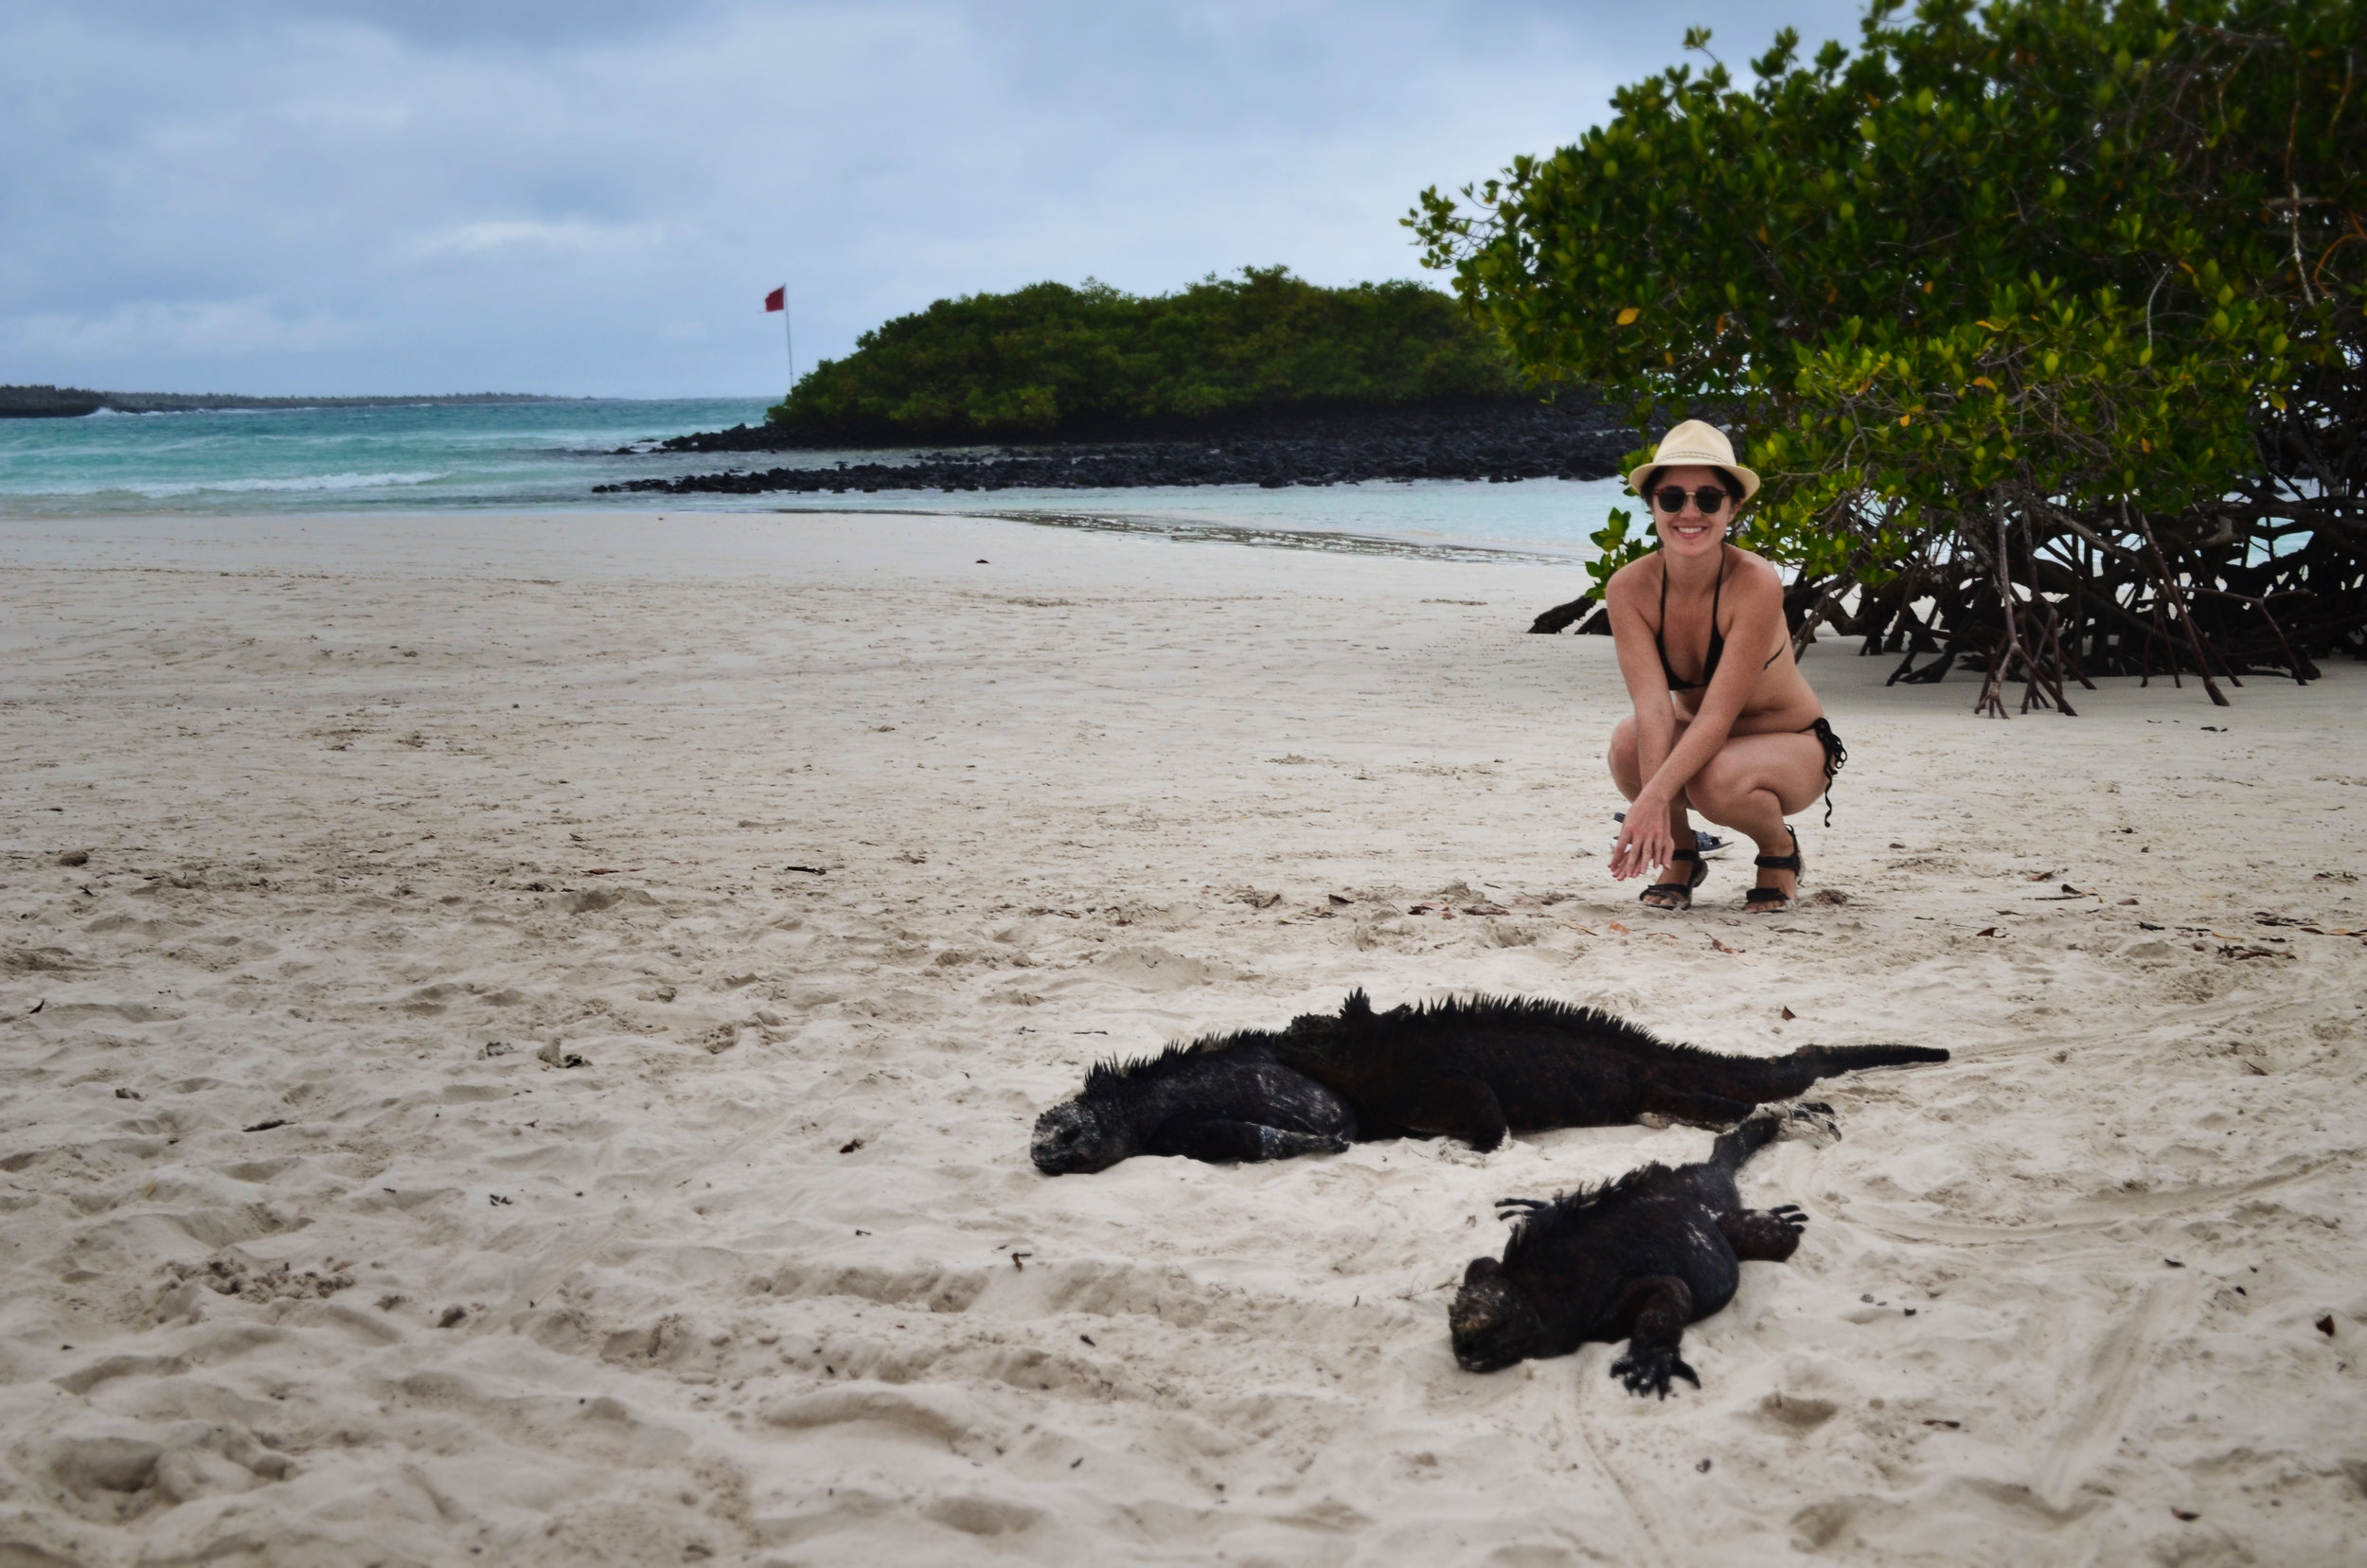 Marine iguanas sunbathe at Tortuga Bay